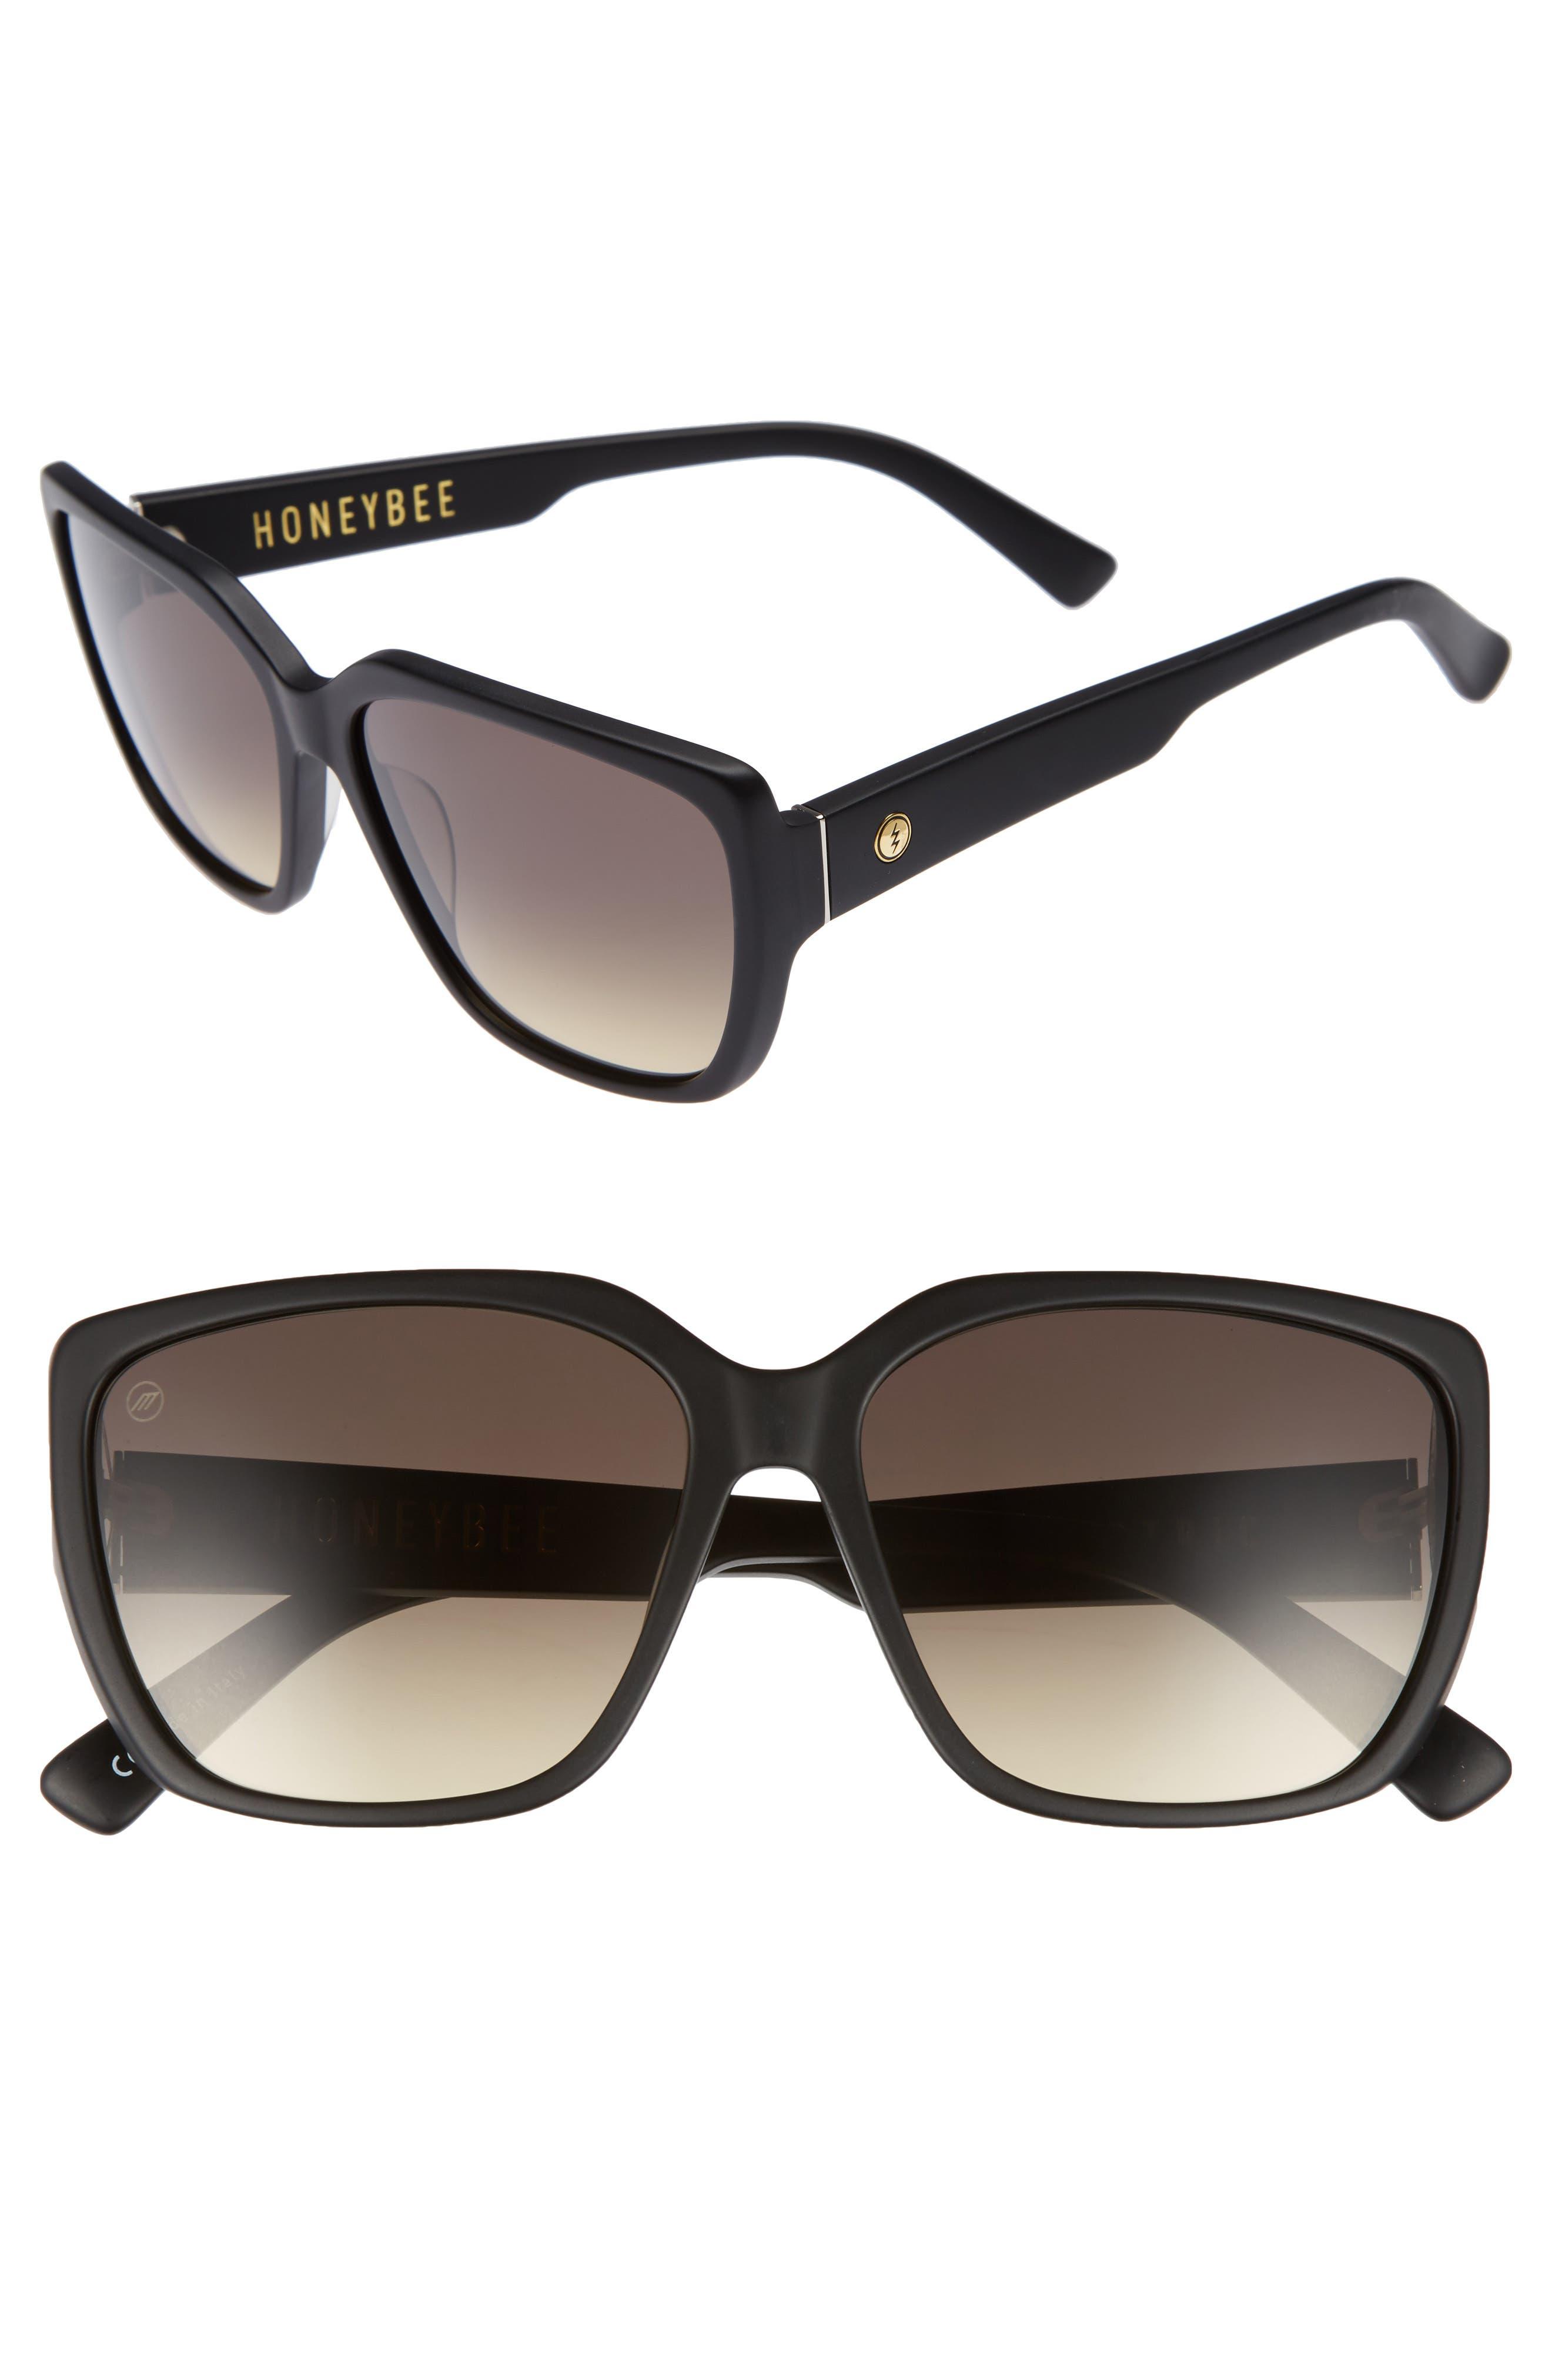 Main Image - Electric Honey Bee 60mm Mirrored Sunglasses